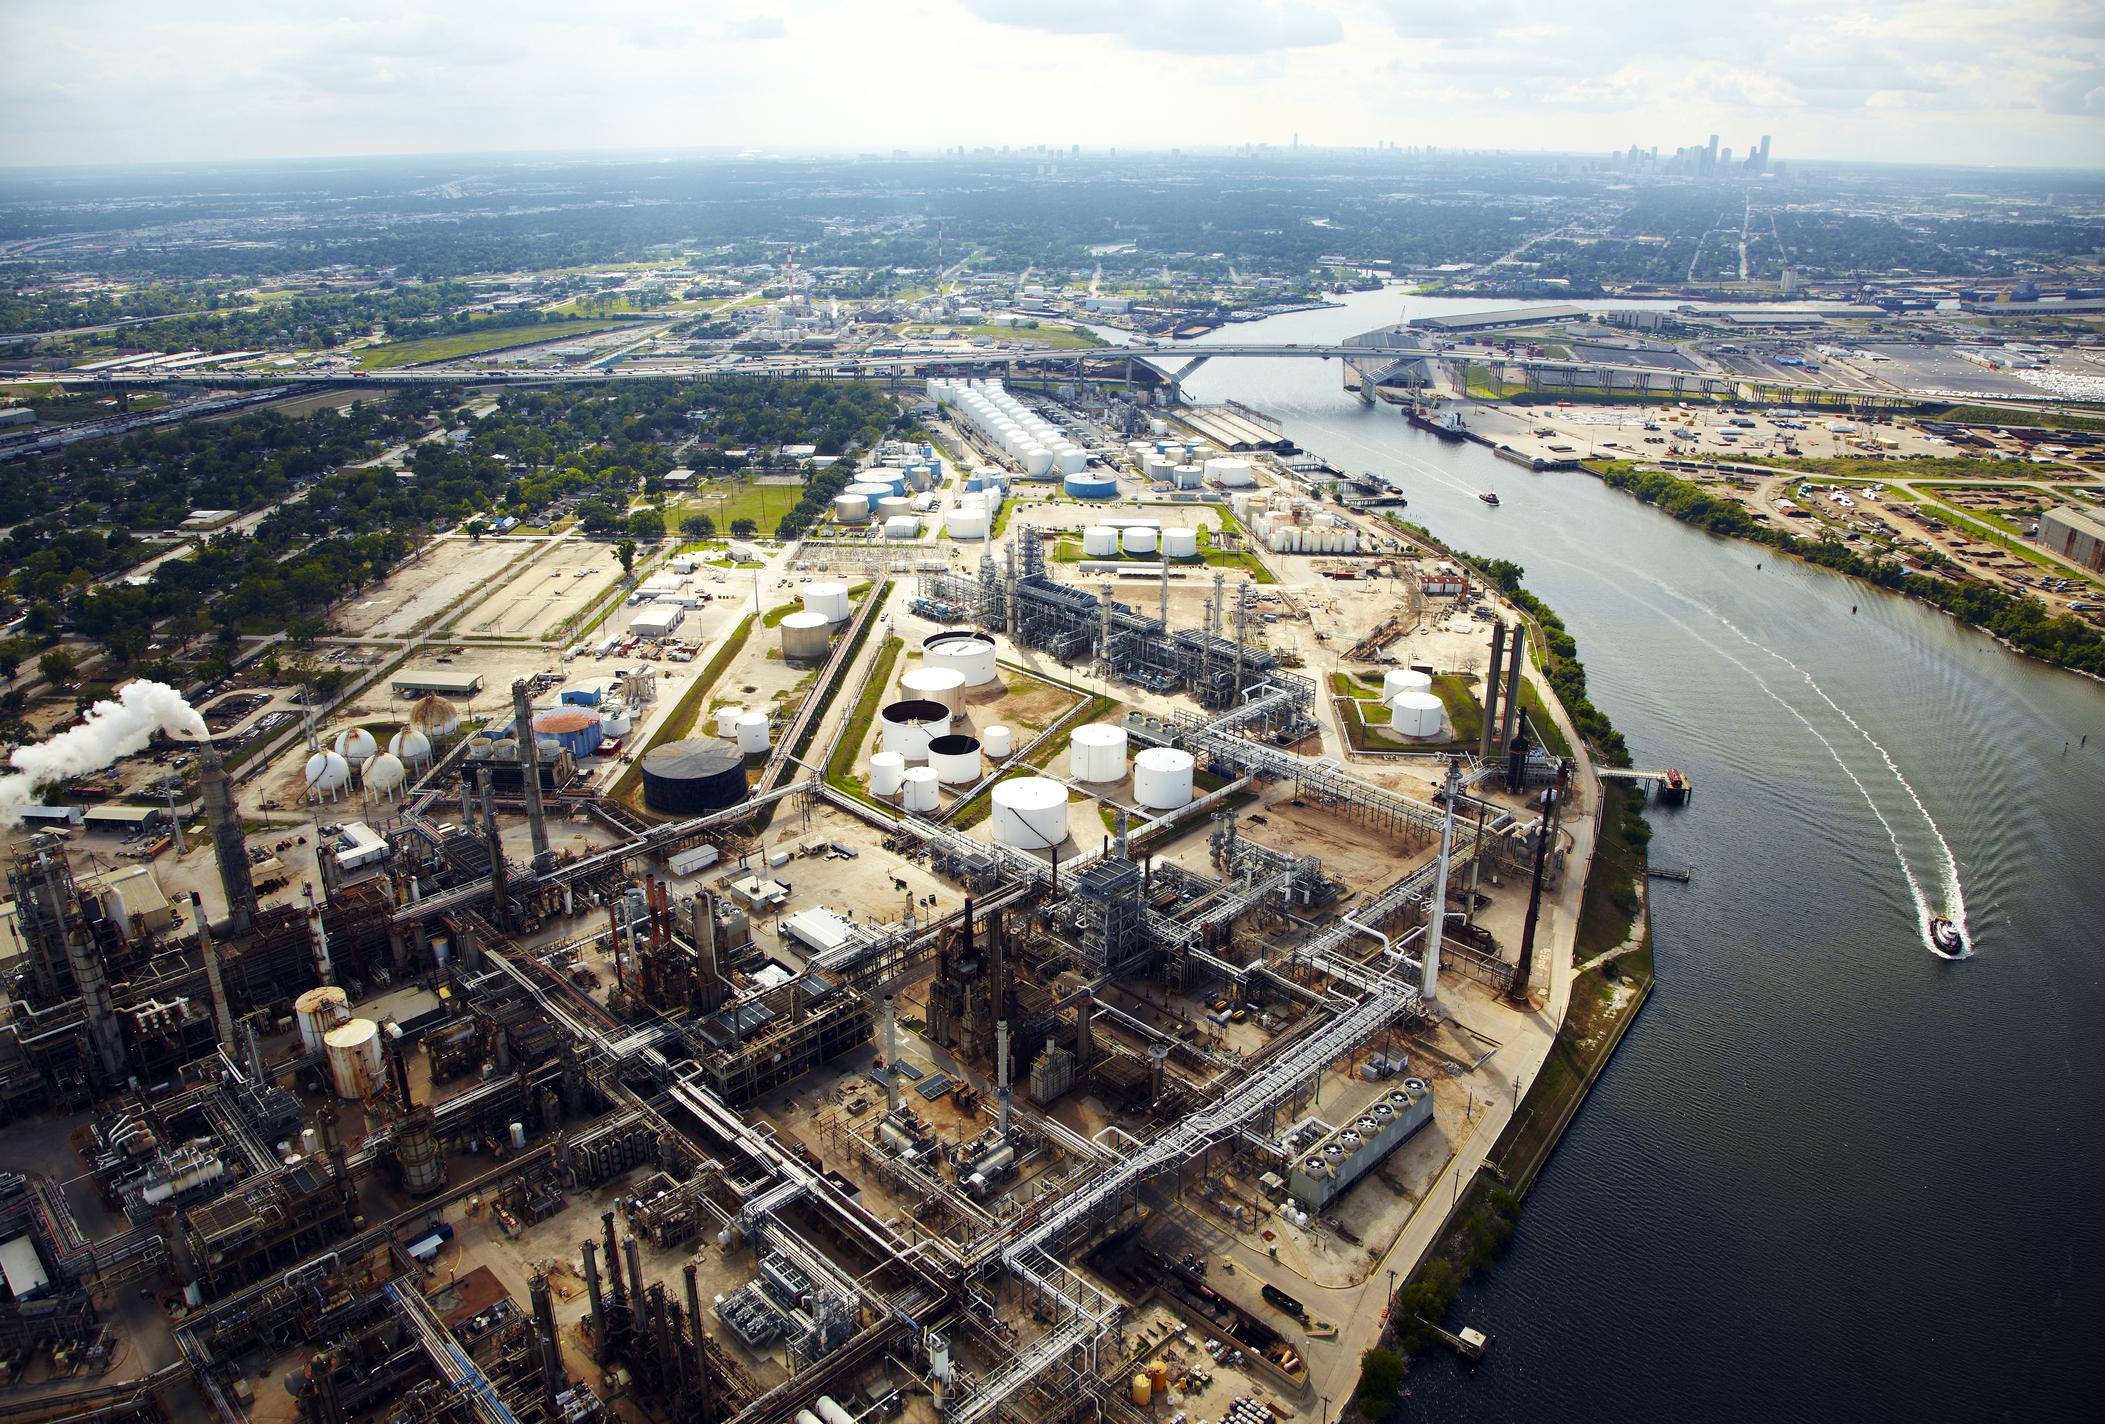 Overhsad shot of oil refinery.